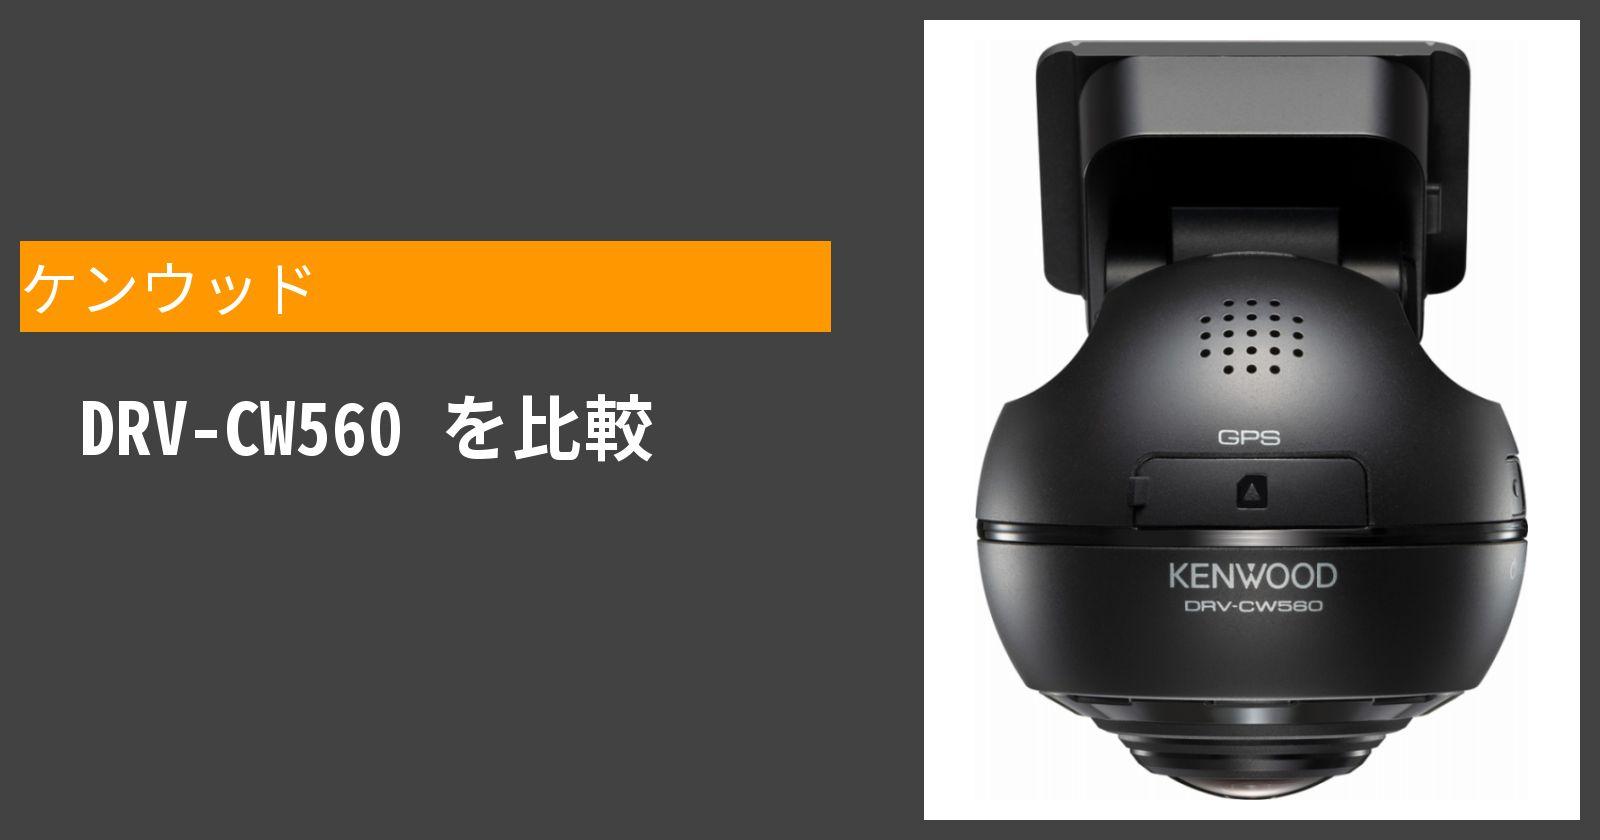 DRV-CW560を徹底評価